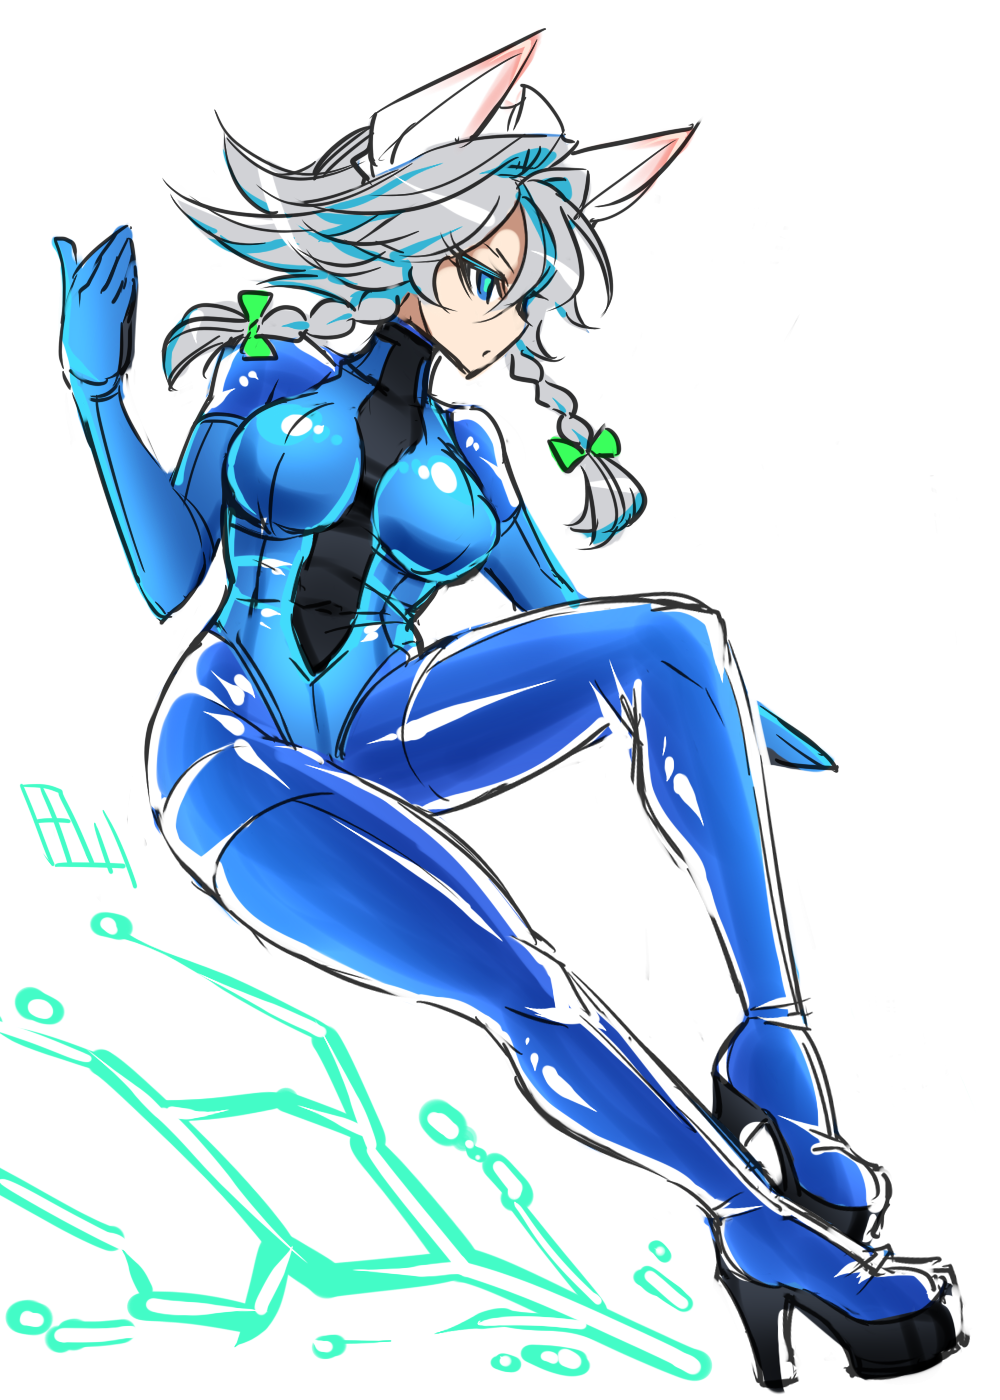 Characters: Human - Page 4 __izayoi_sakuya_touhou_drawn_by_tajima_yuuki__3f66_by_akiyamamoto77-dbrka4y